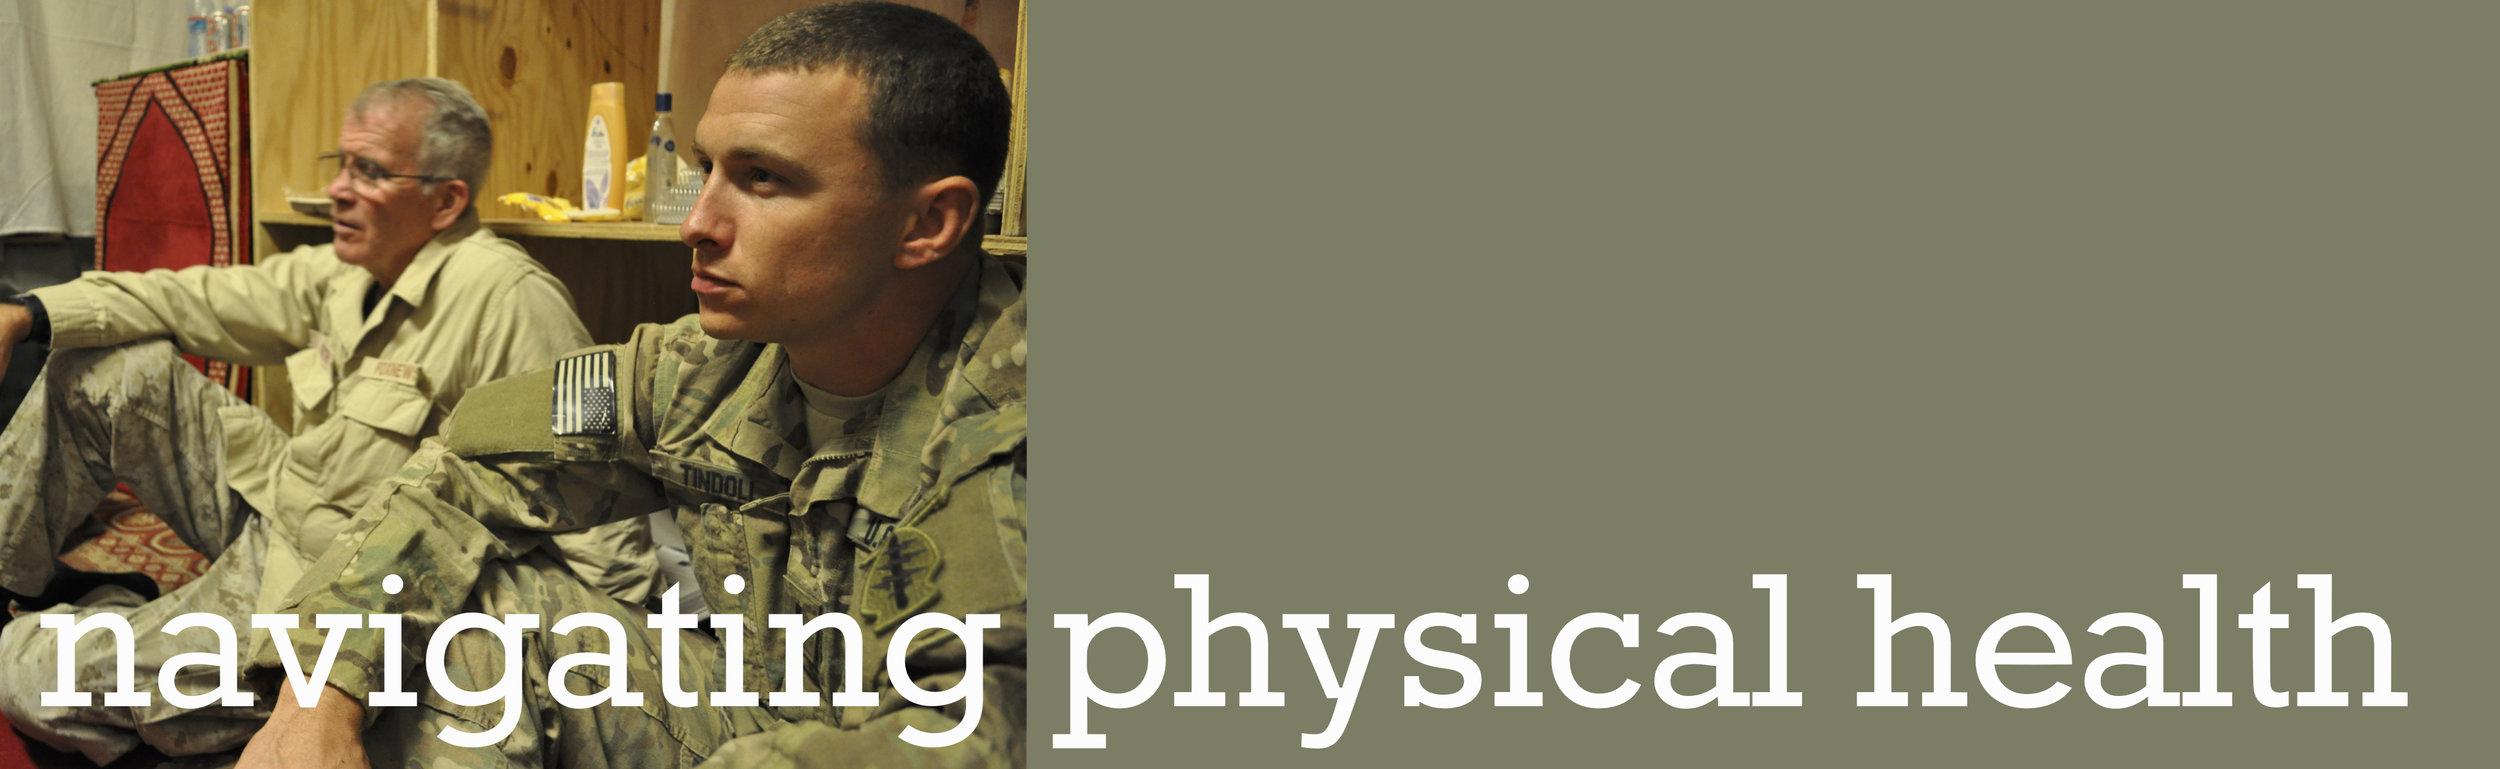 physical health.jpg